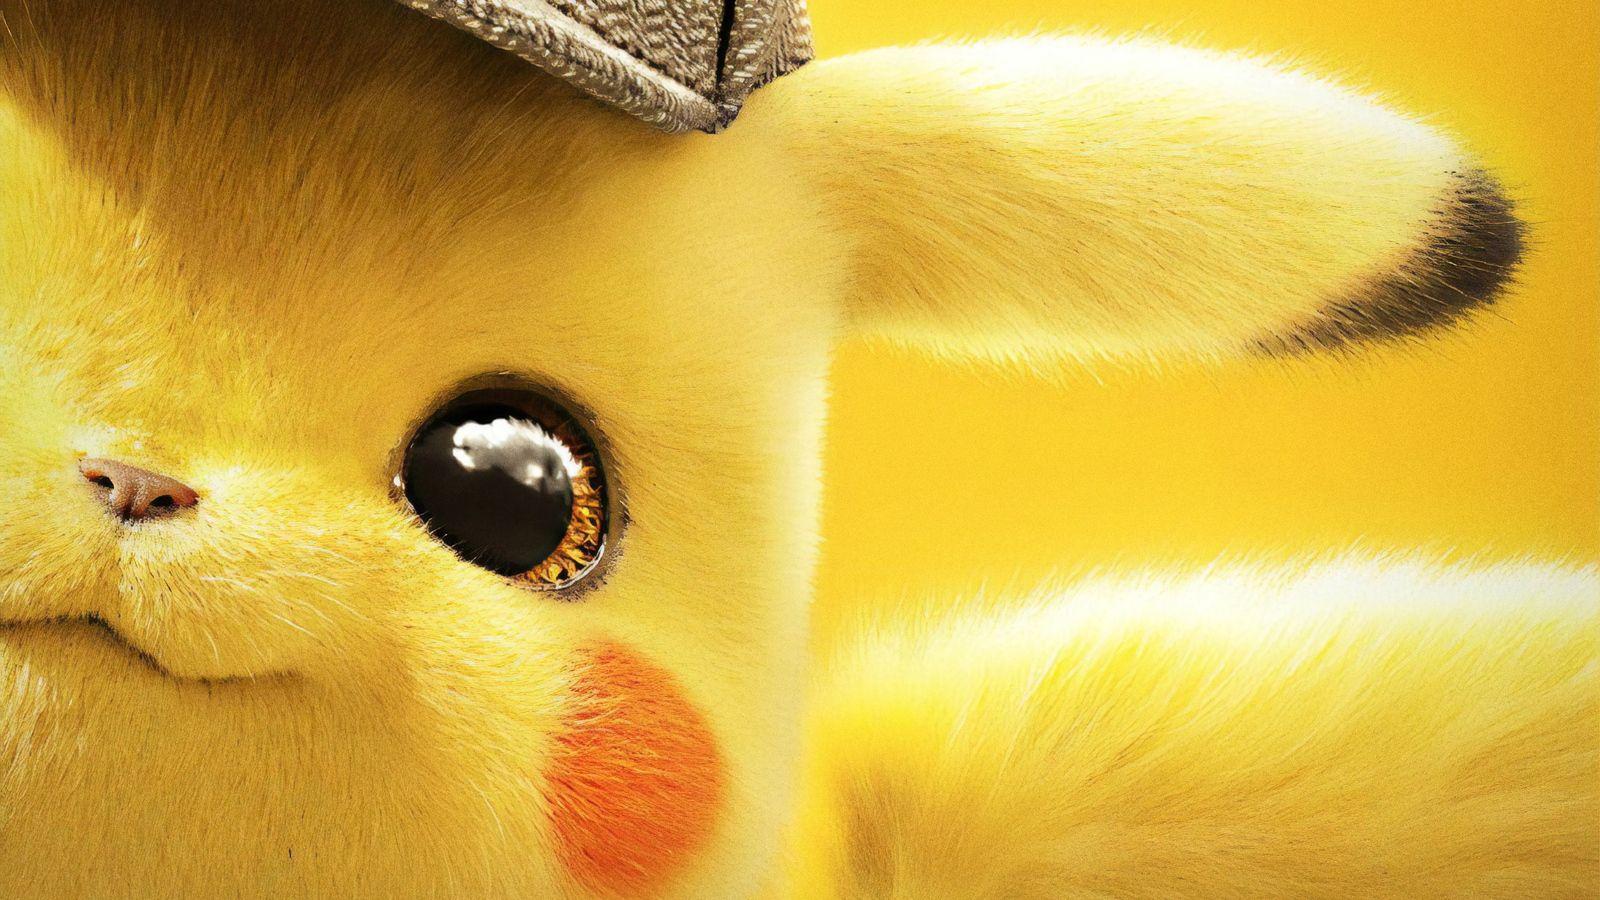 Pokemon Cute Pikachu 4k Wallpapers Top Free Pokemon Cute Pikachu 4k Backgrounds Wallpaperaccess